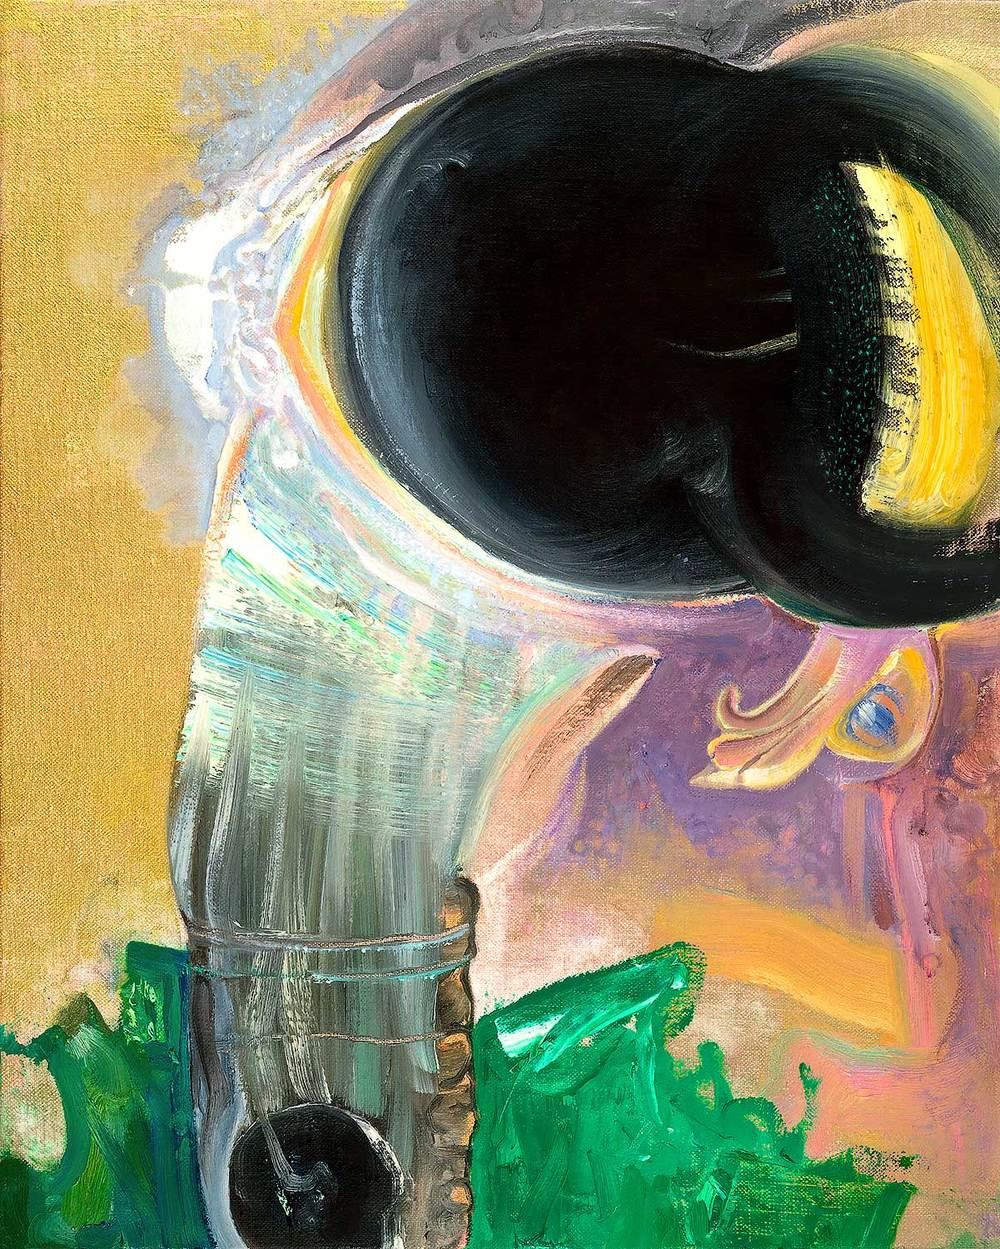 Brian Wood <br> Fravartis, 2015 <br> Oil on linen <br> 20 x 16 in.